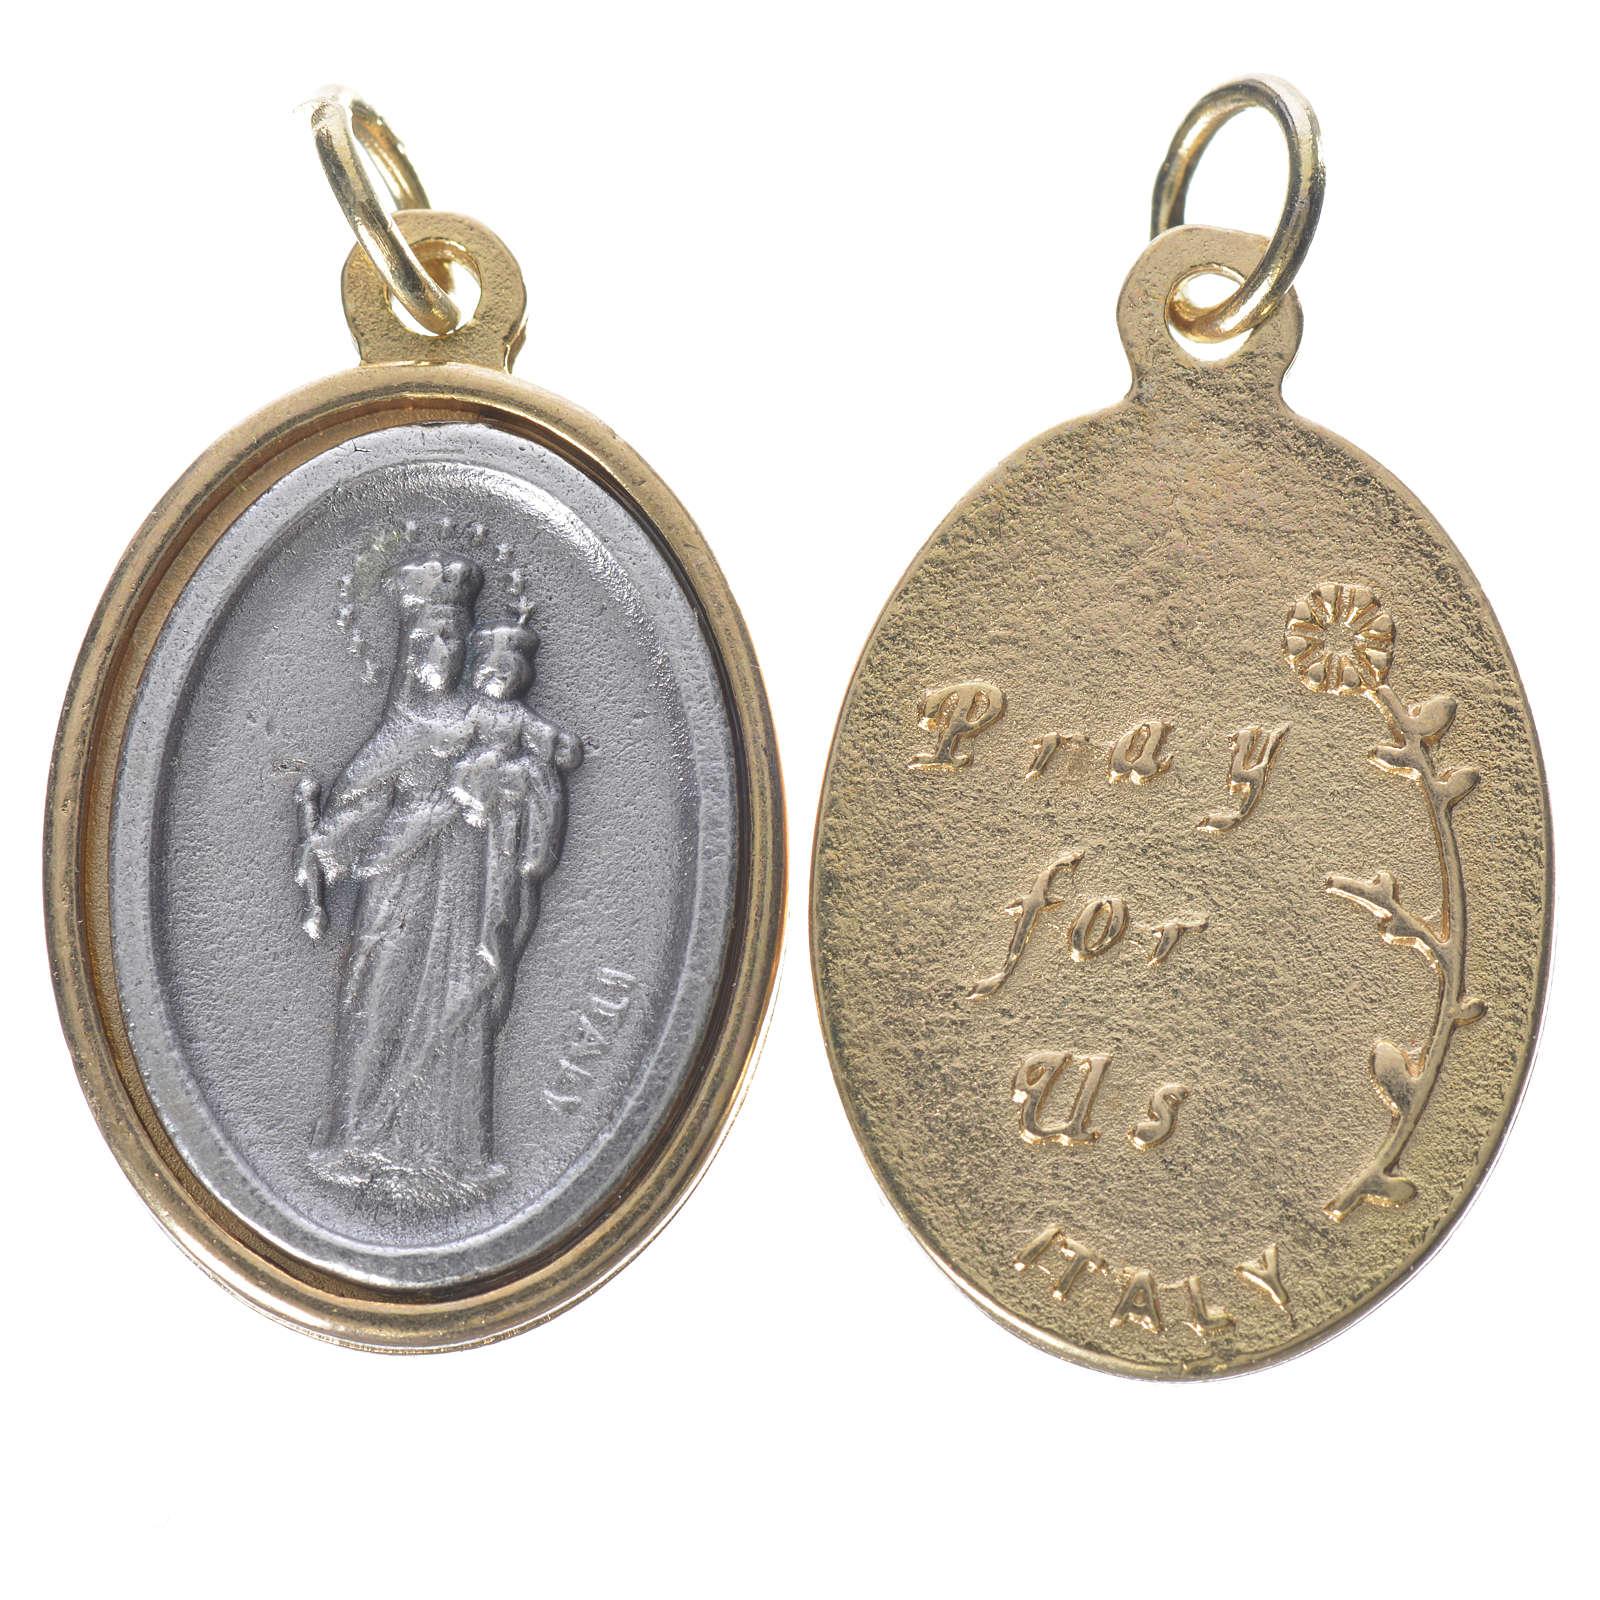 Medaille Maria Helferin Metall vergoldet versilbert 2,5cm groß 4